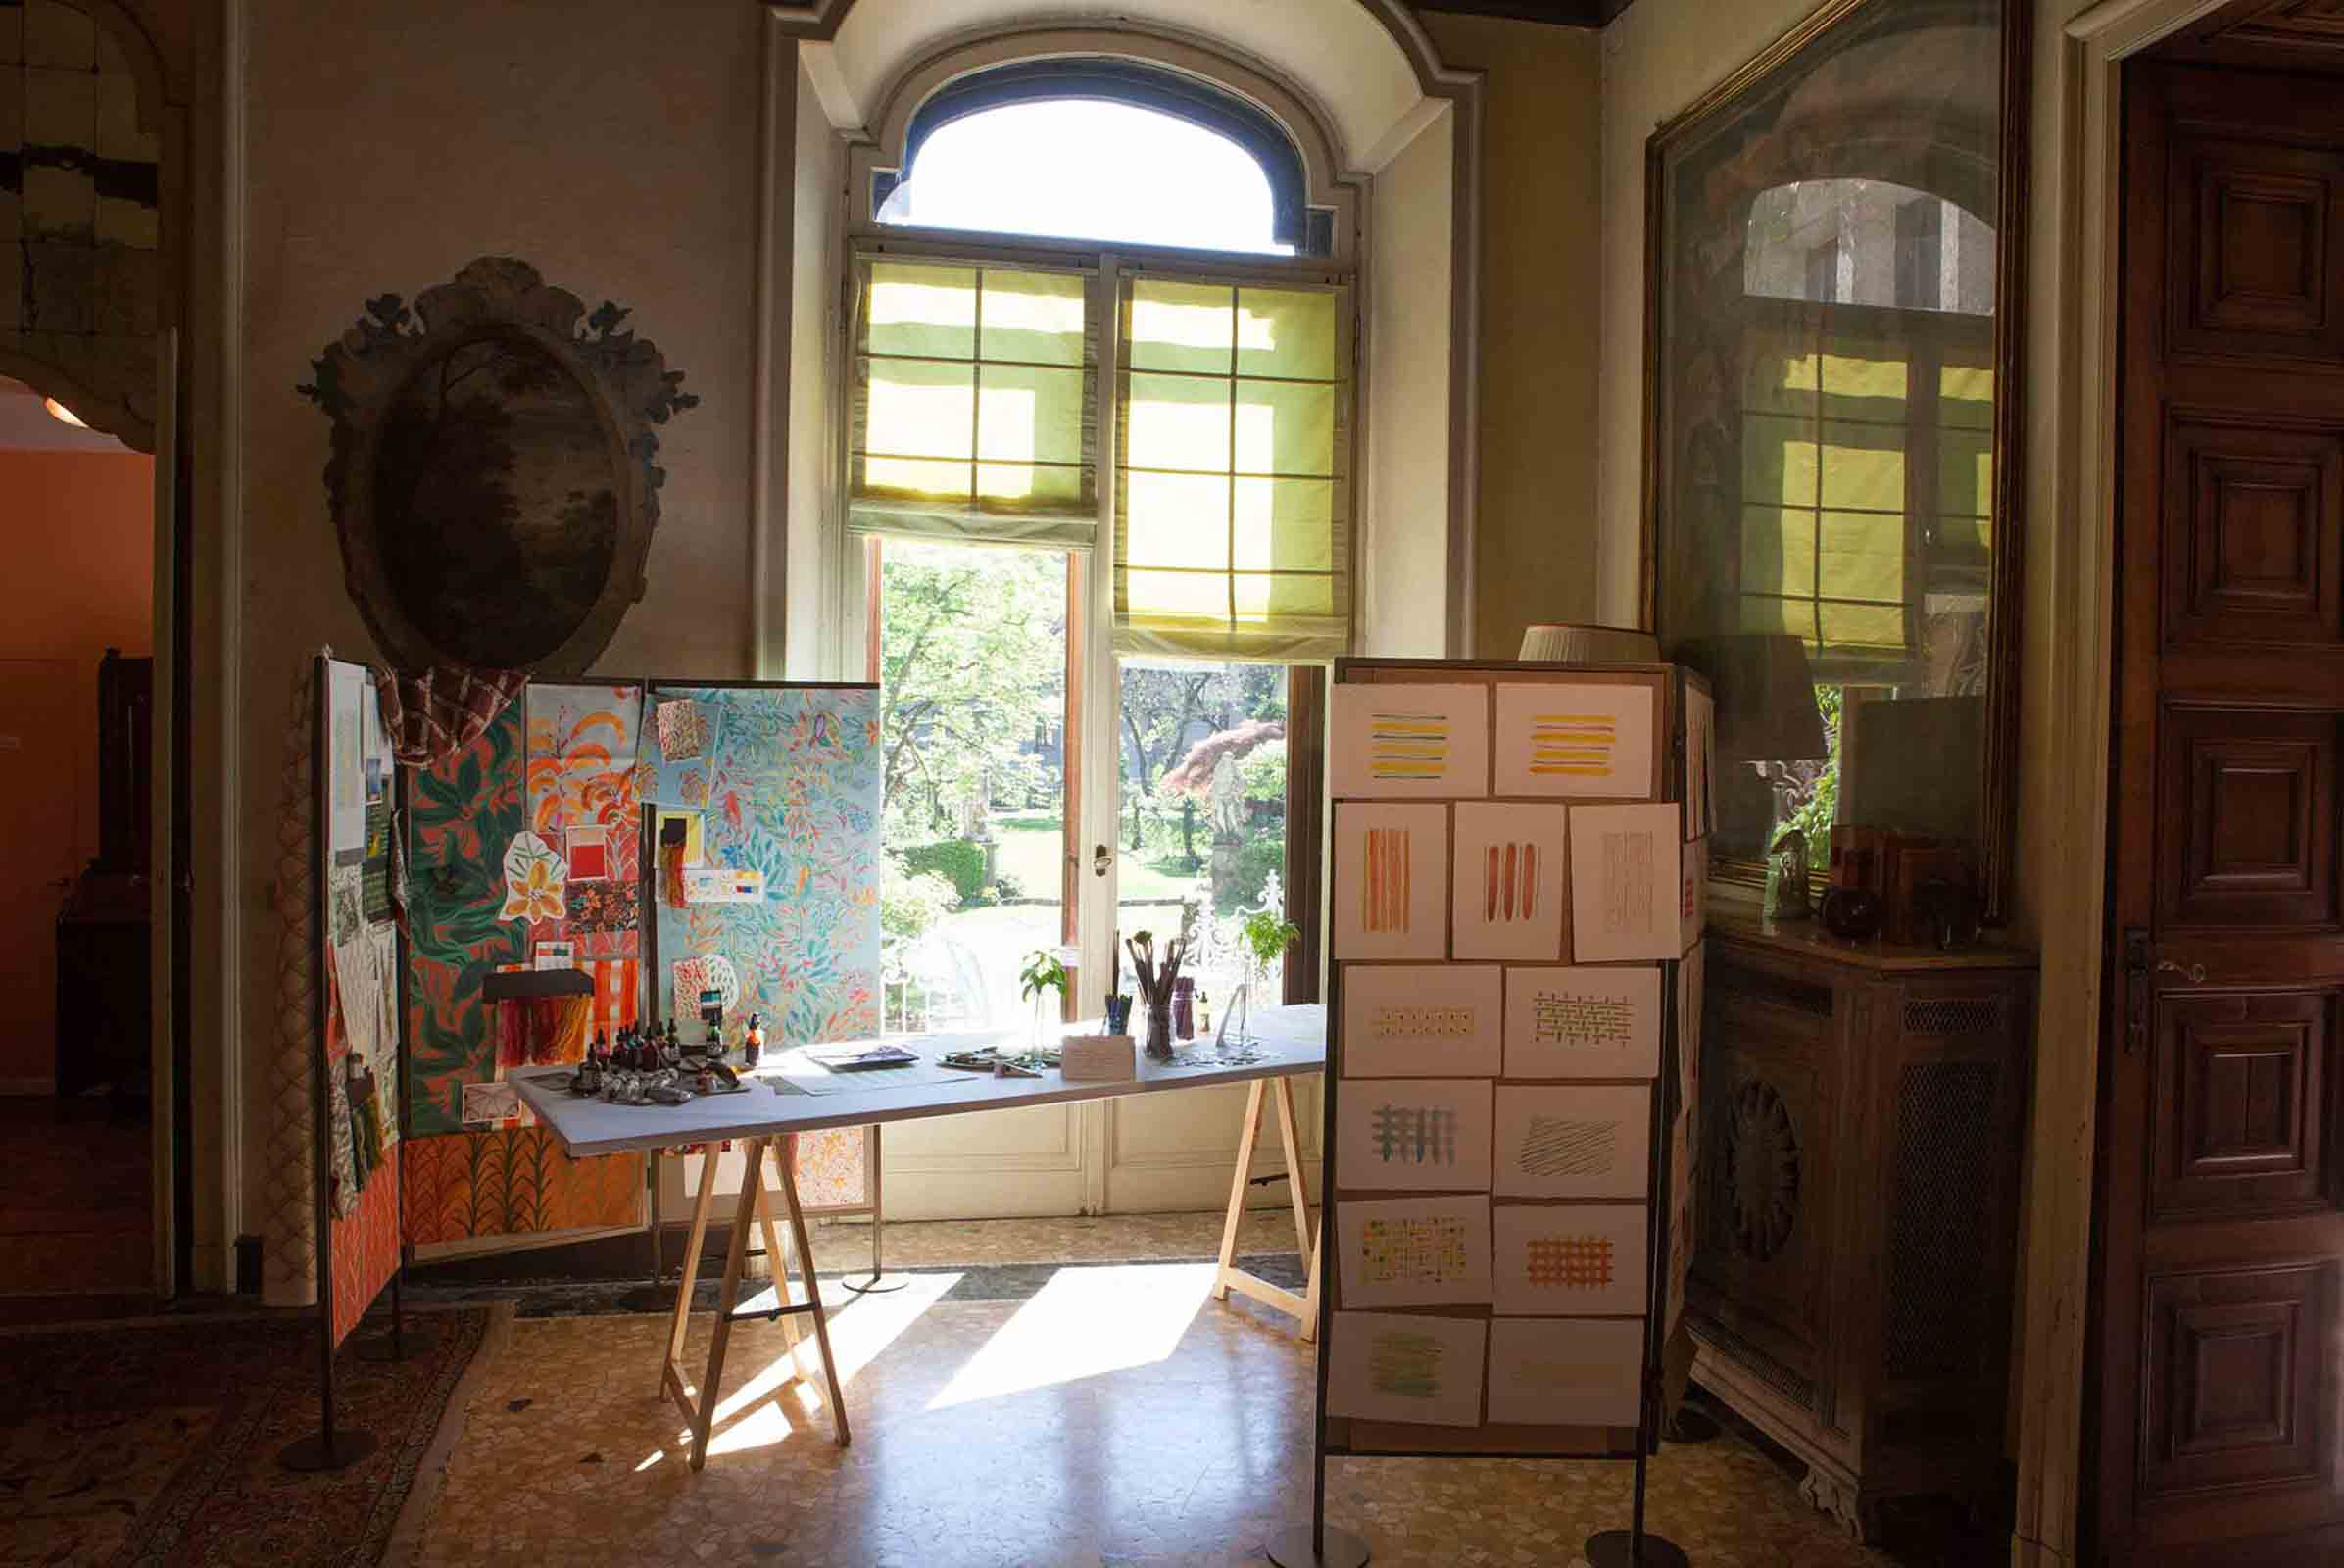 Matteo-Thun-at-Passeggiata,-An-Airbnb-Experience-of-Milan.jpg